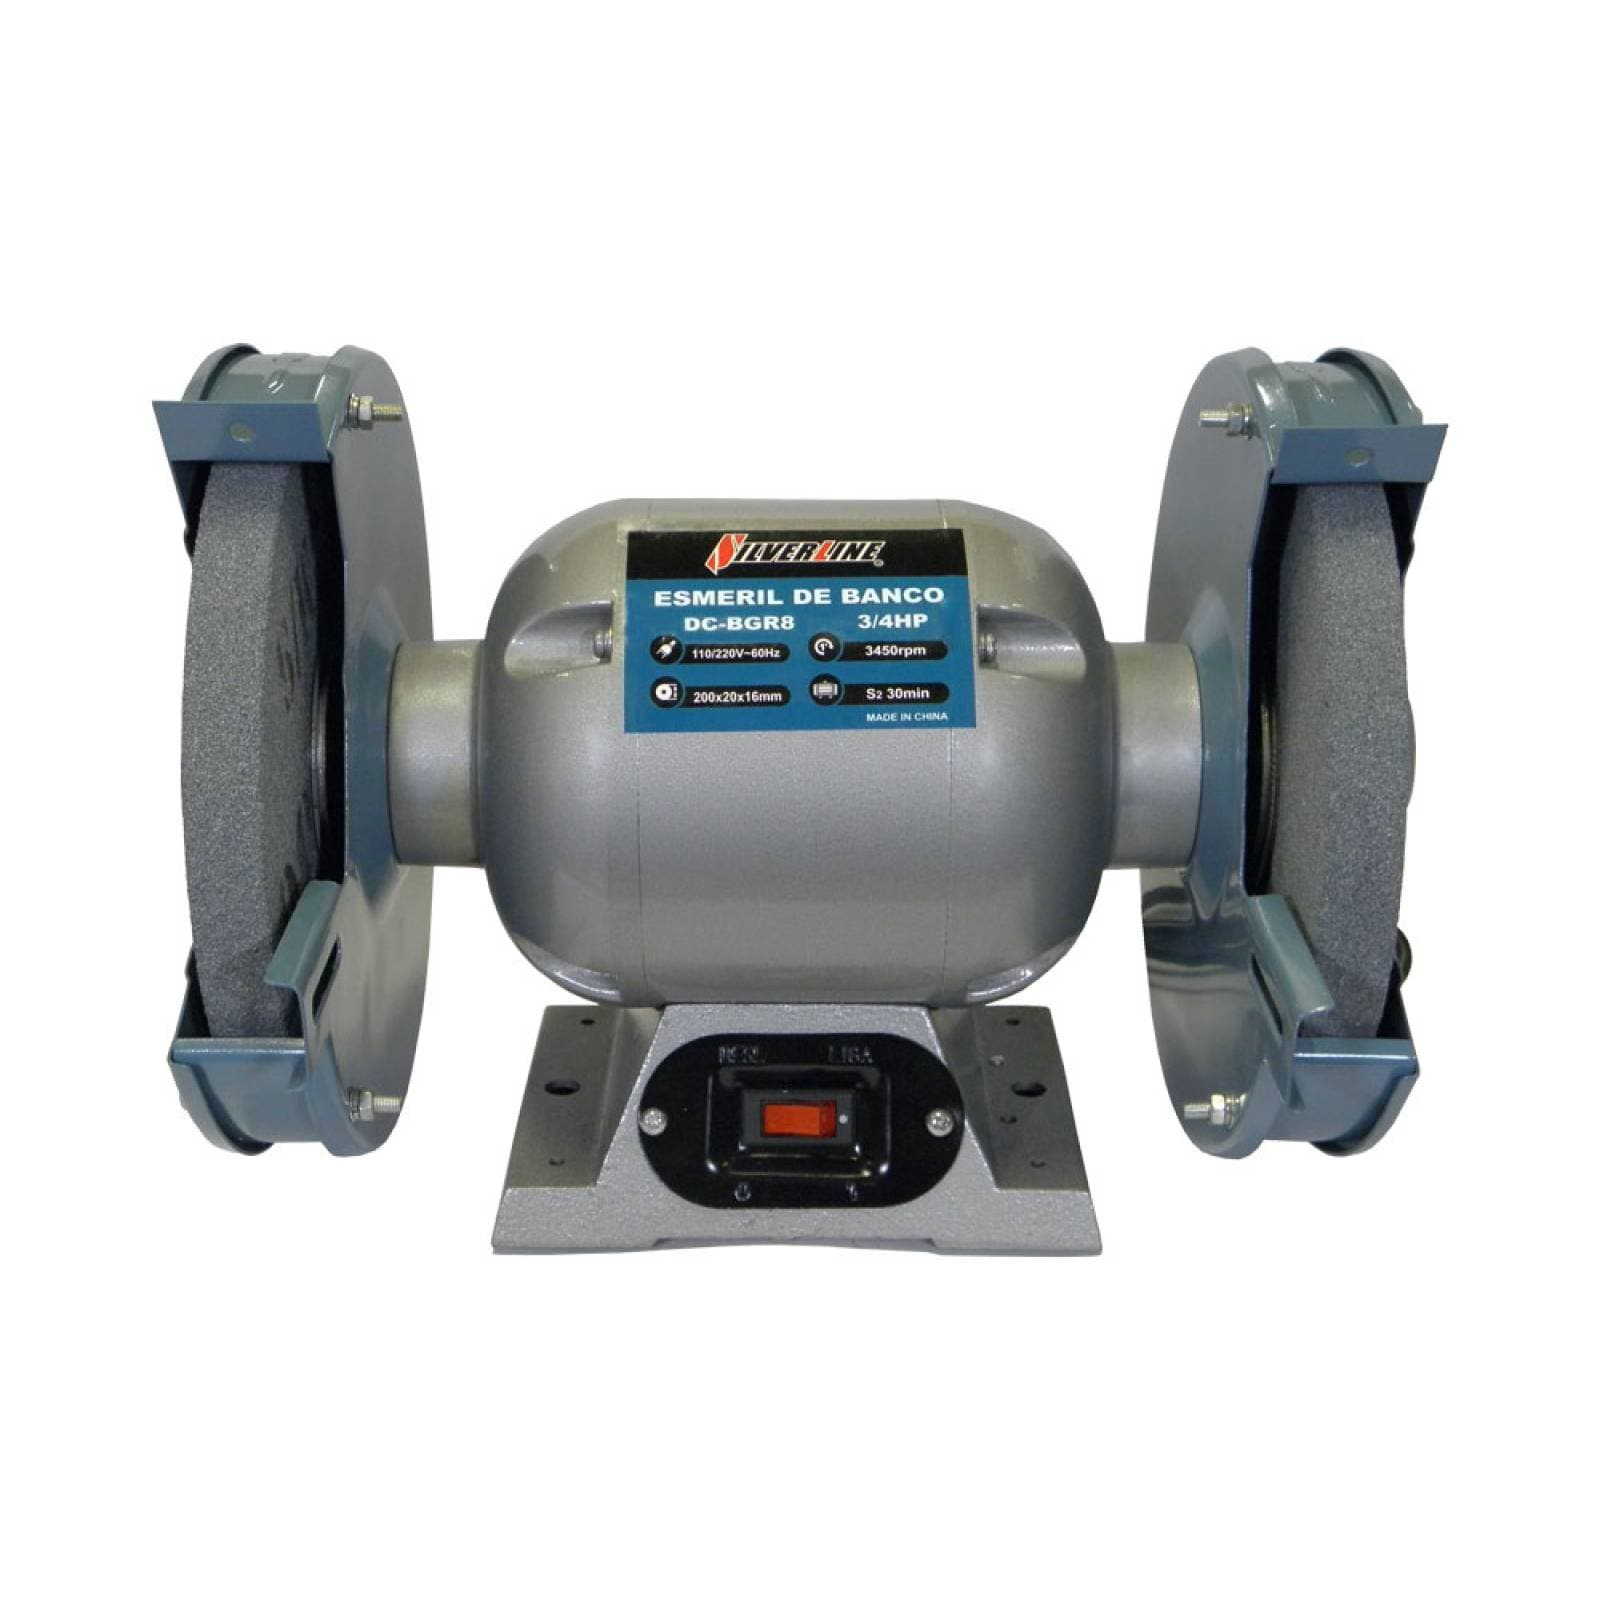 Esmeril Banco 8 Pulgadas Motor 3/4 Hp 1 Fase Silverline